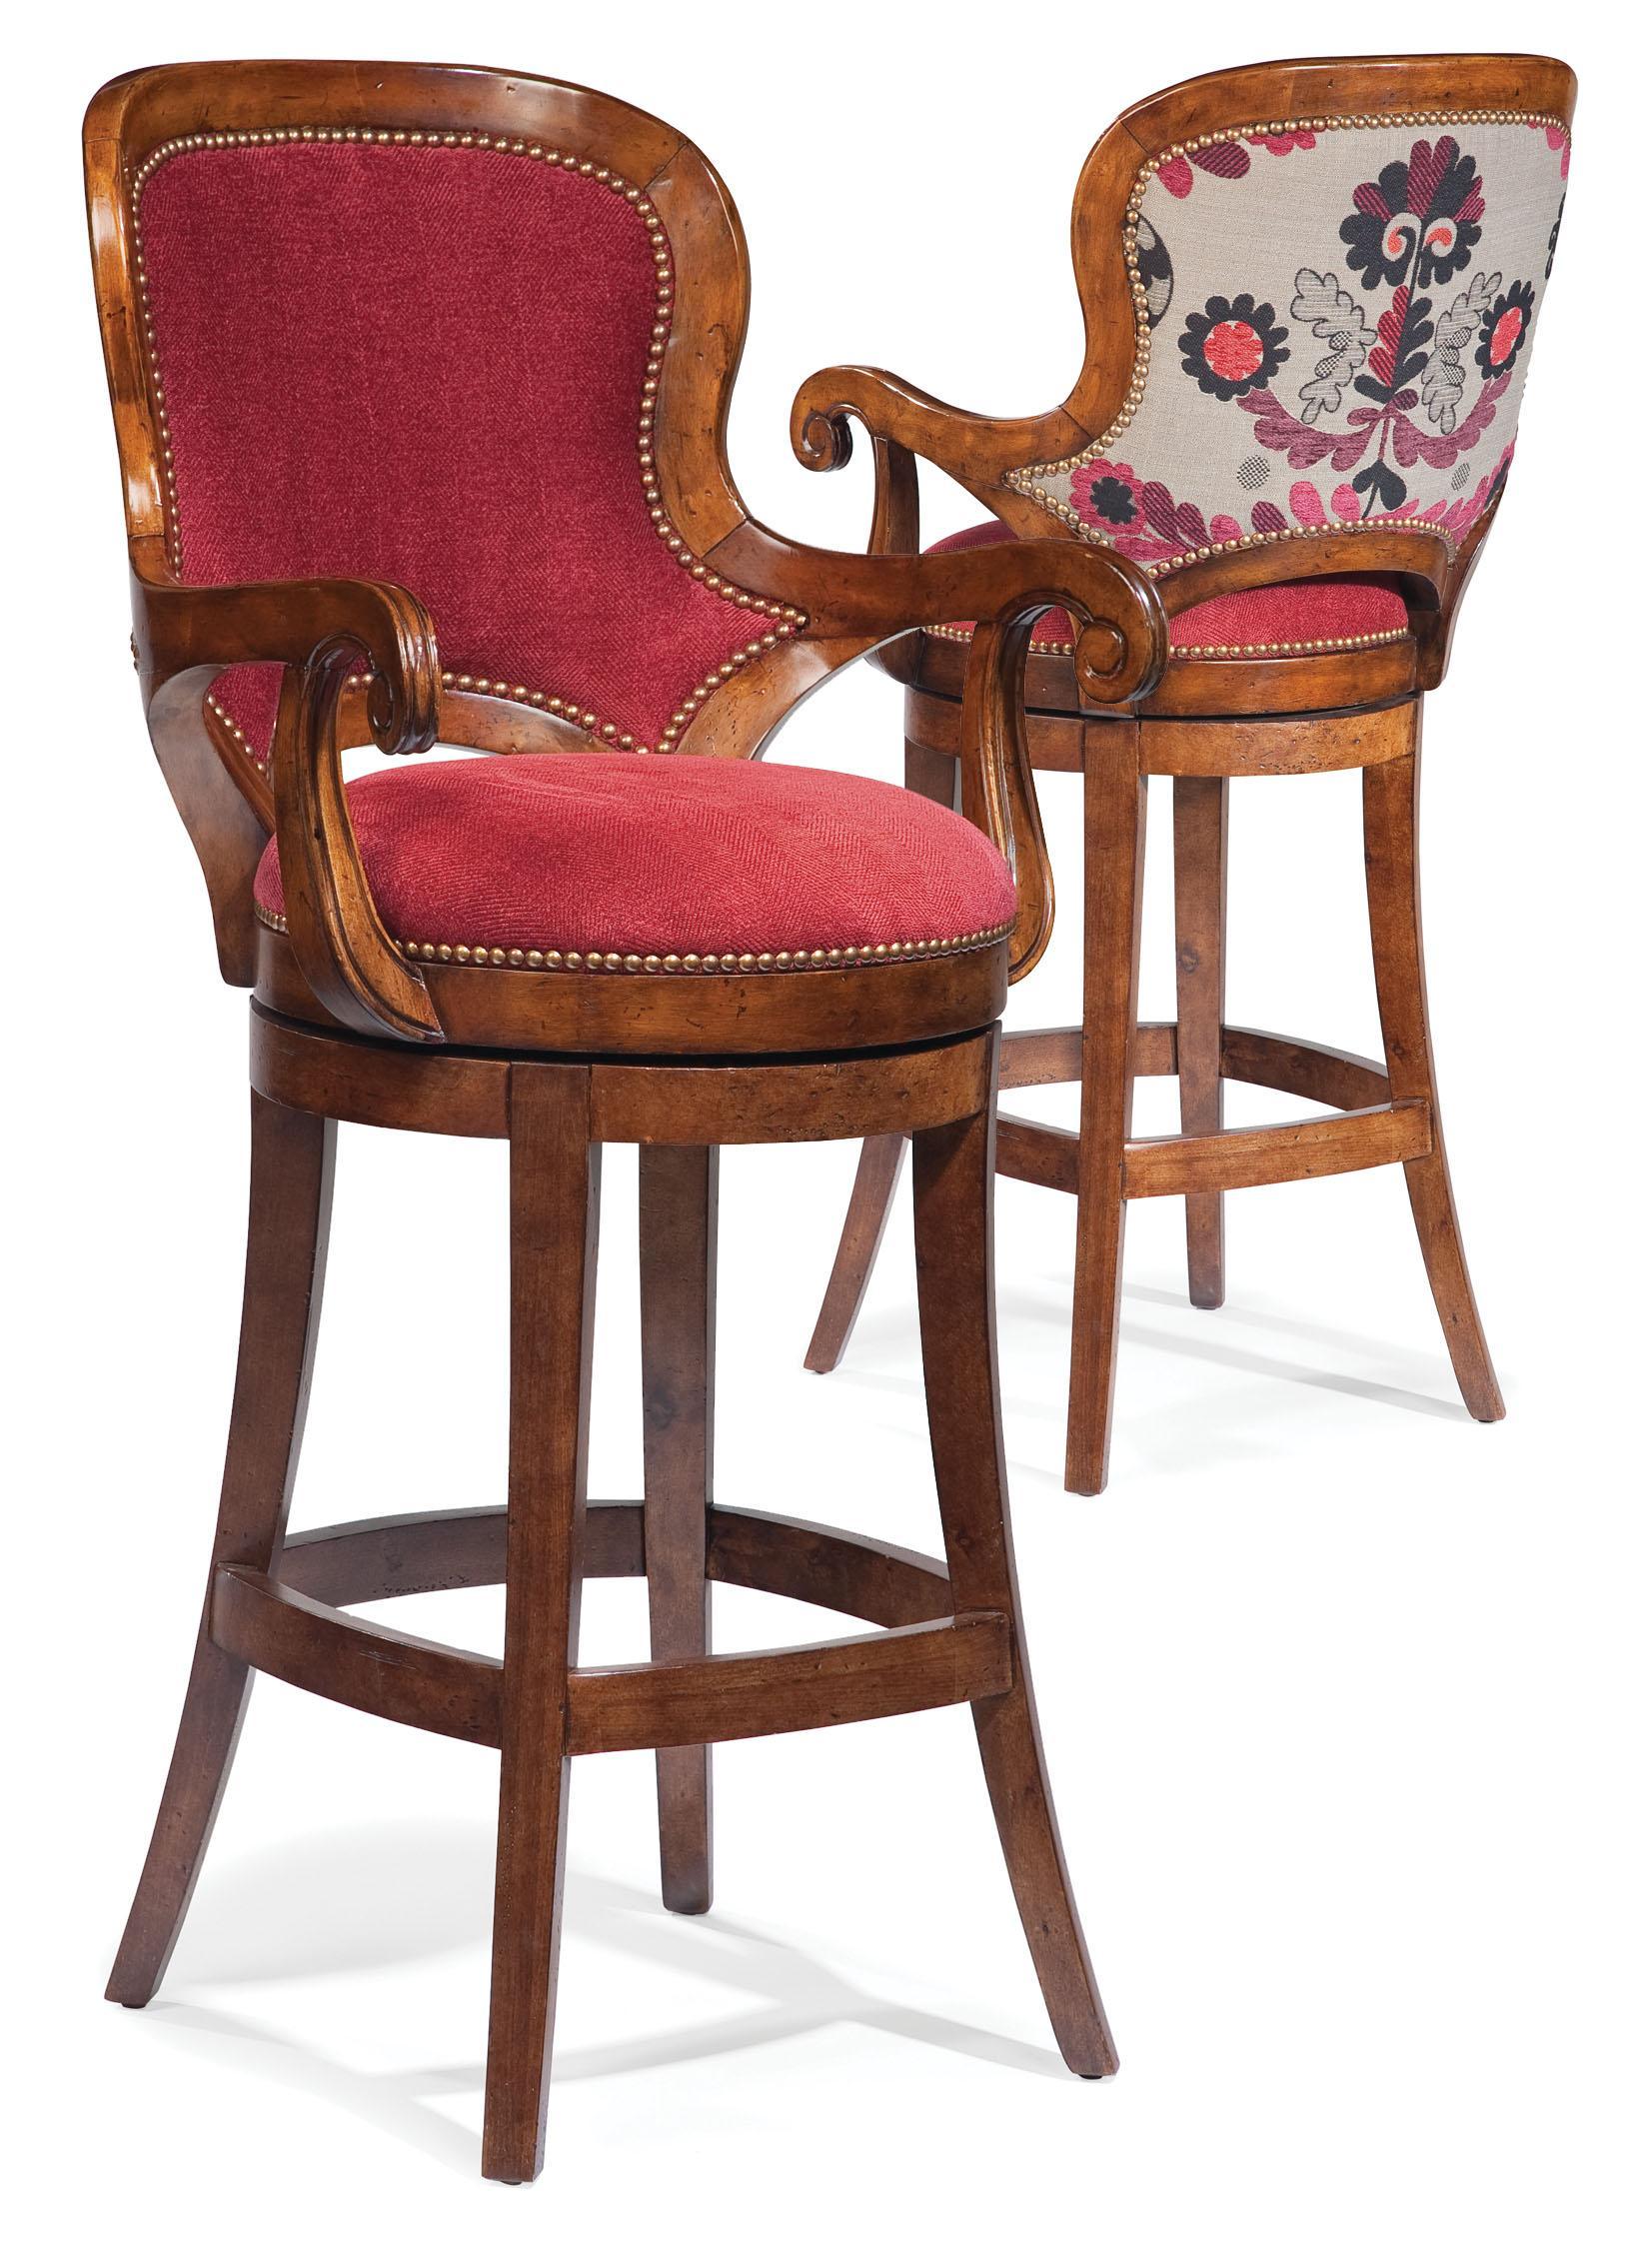 Swell Fairfield Barstools 5034 06 Wooden Bar Stool With Camellatalisay Diy Chair Ideas Camellatalisaycom